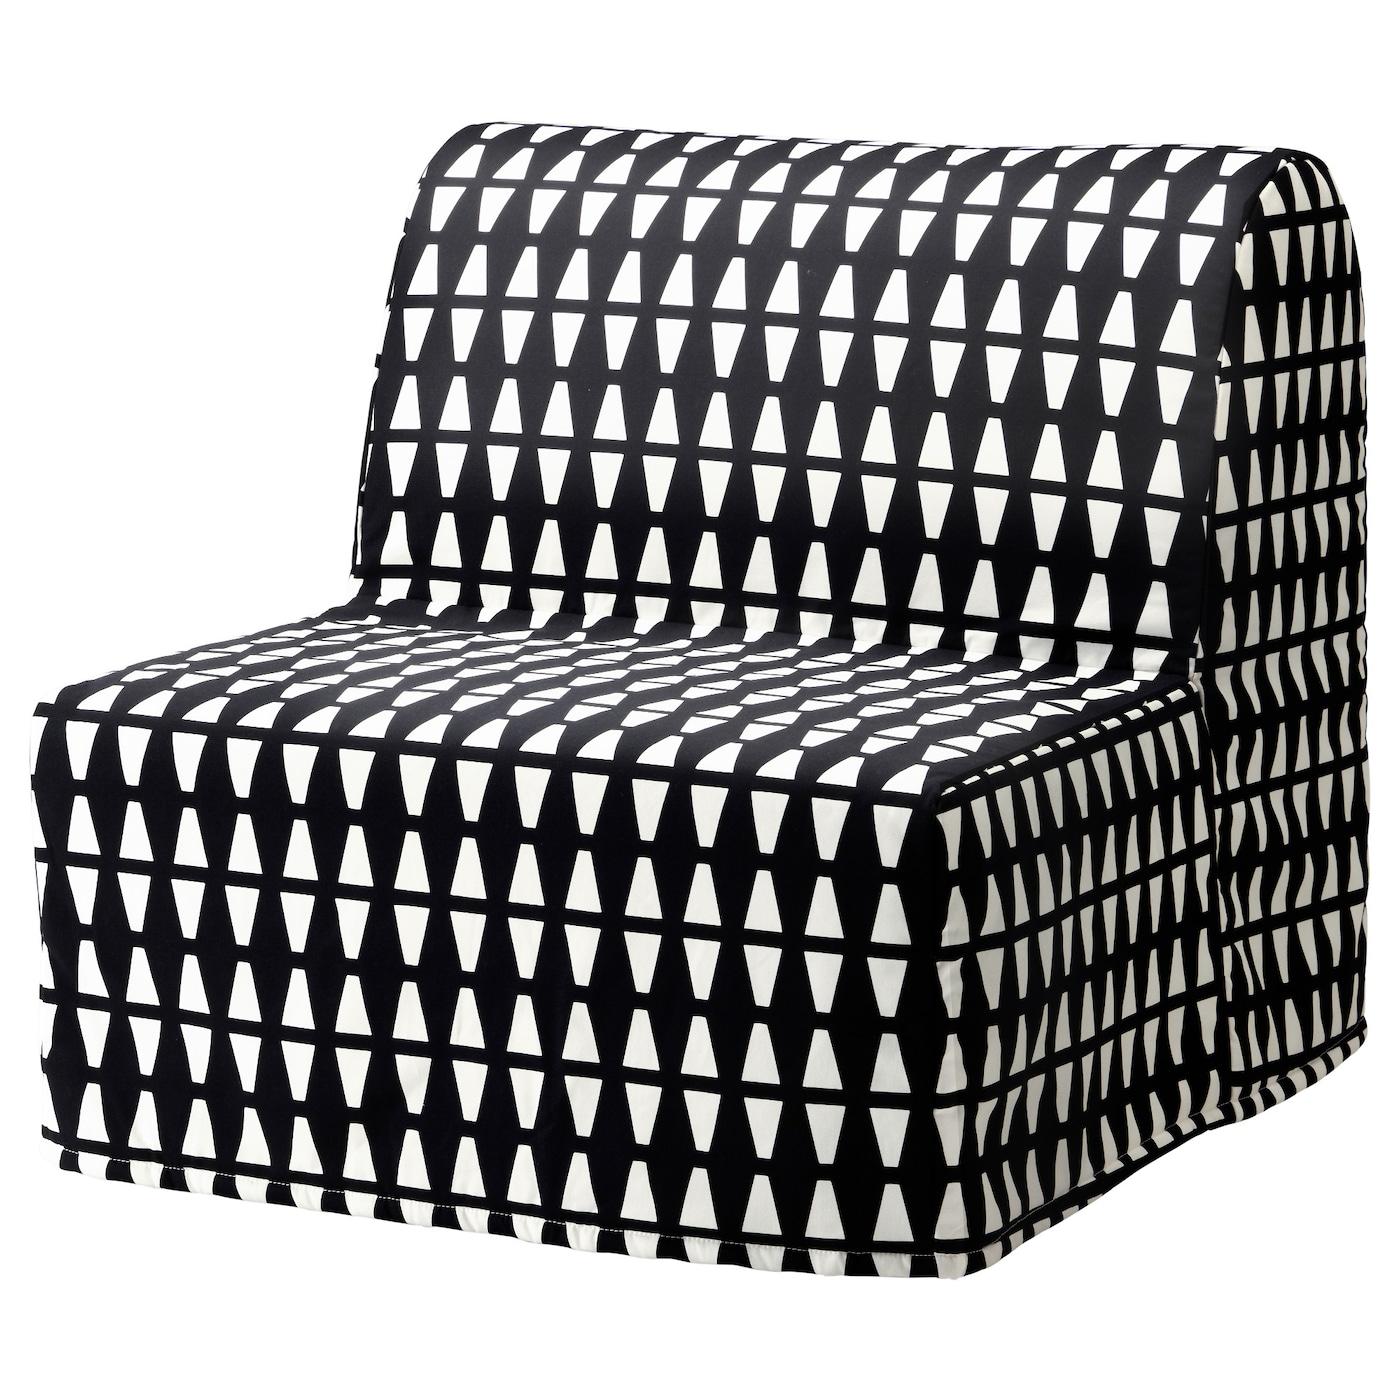 Ikea Lycksele LÖvÅs Chair Bed A Simple Firm Foam Mattress For Use Every Night